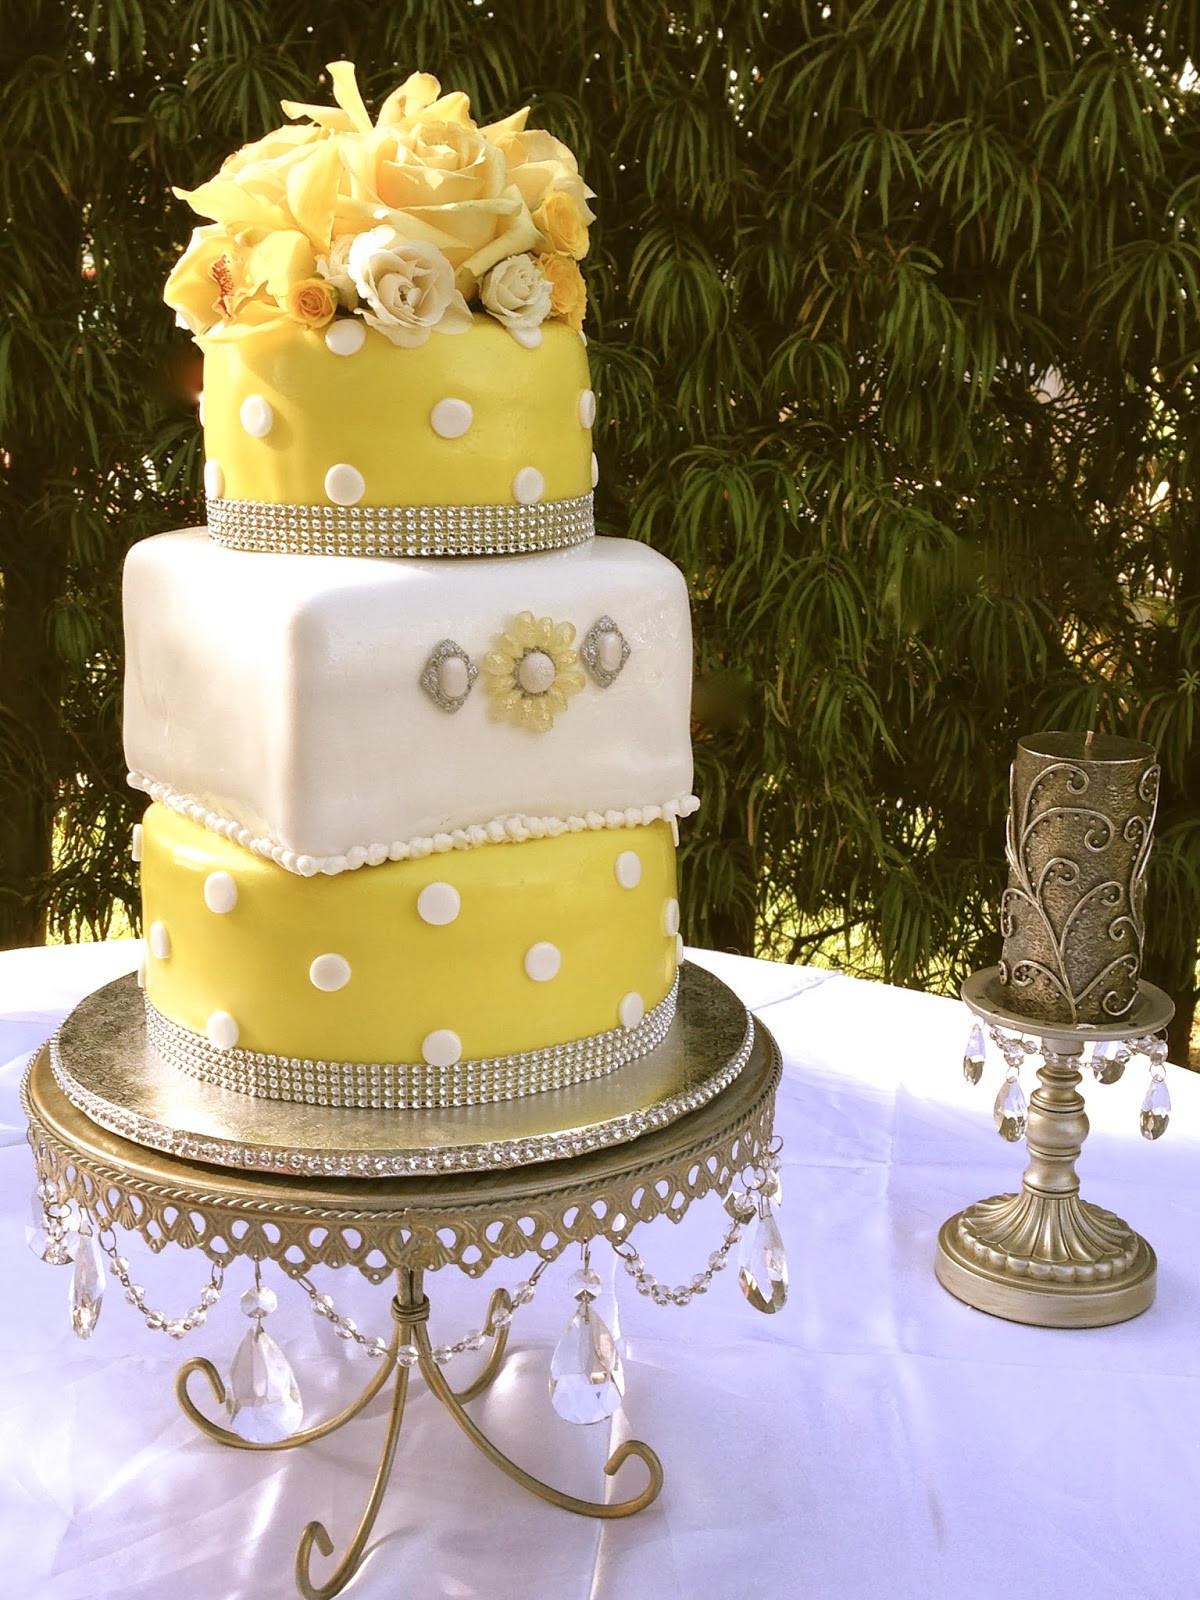 Polka Dotted Wedding Cakes  Plumeria Cake Studio Yellow Polka Dot Wedding Cake and Treats